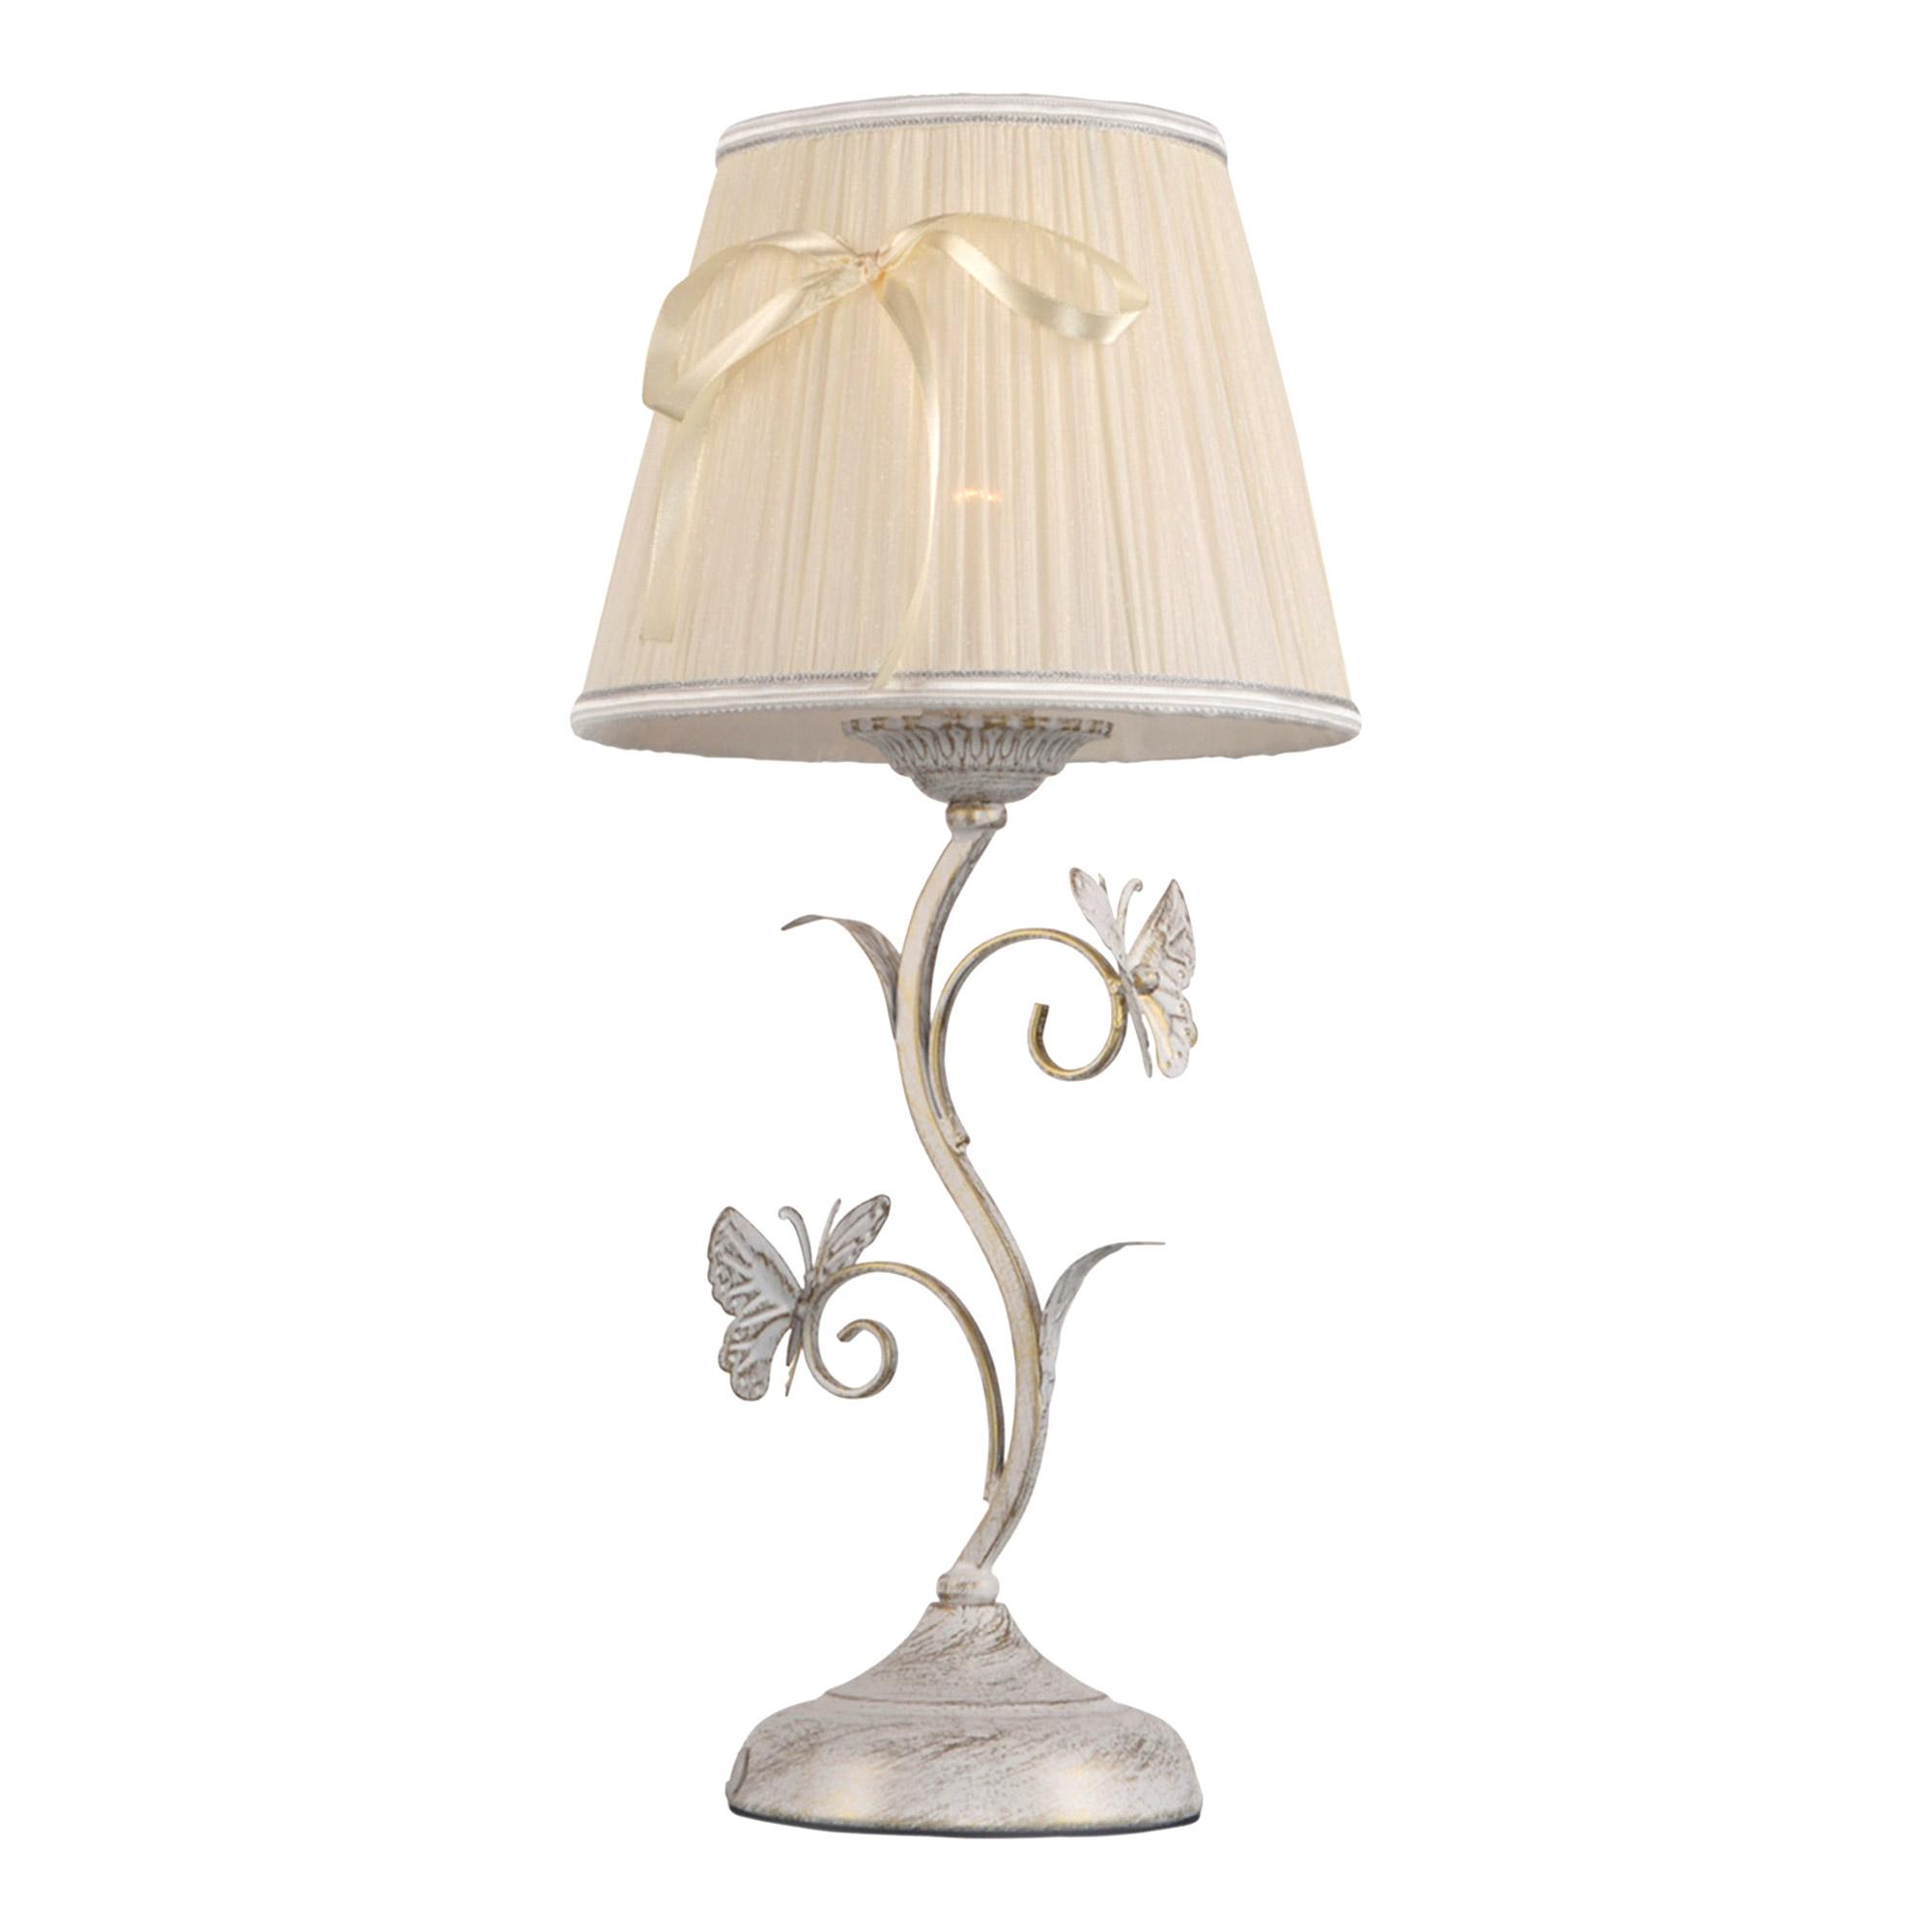 Лампа настольная Rivoli farfalla t1 wg 40w (2014-501) сумка farfalla rosso